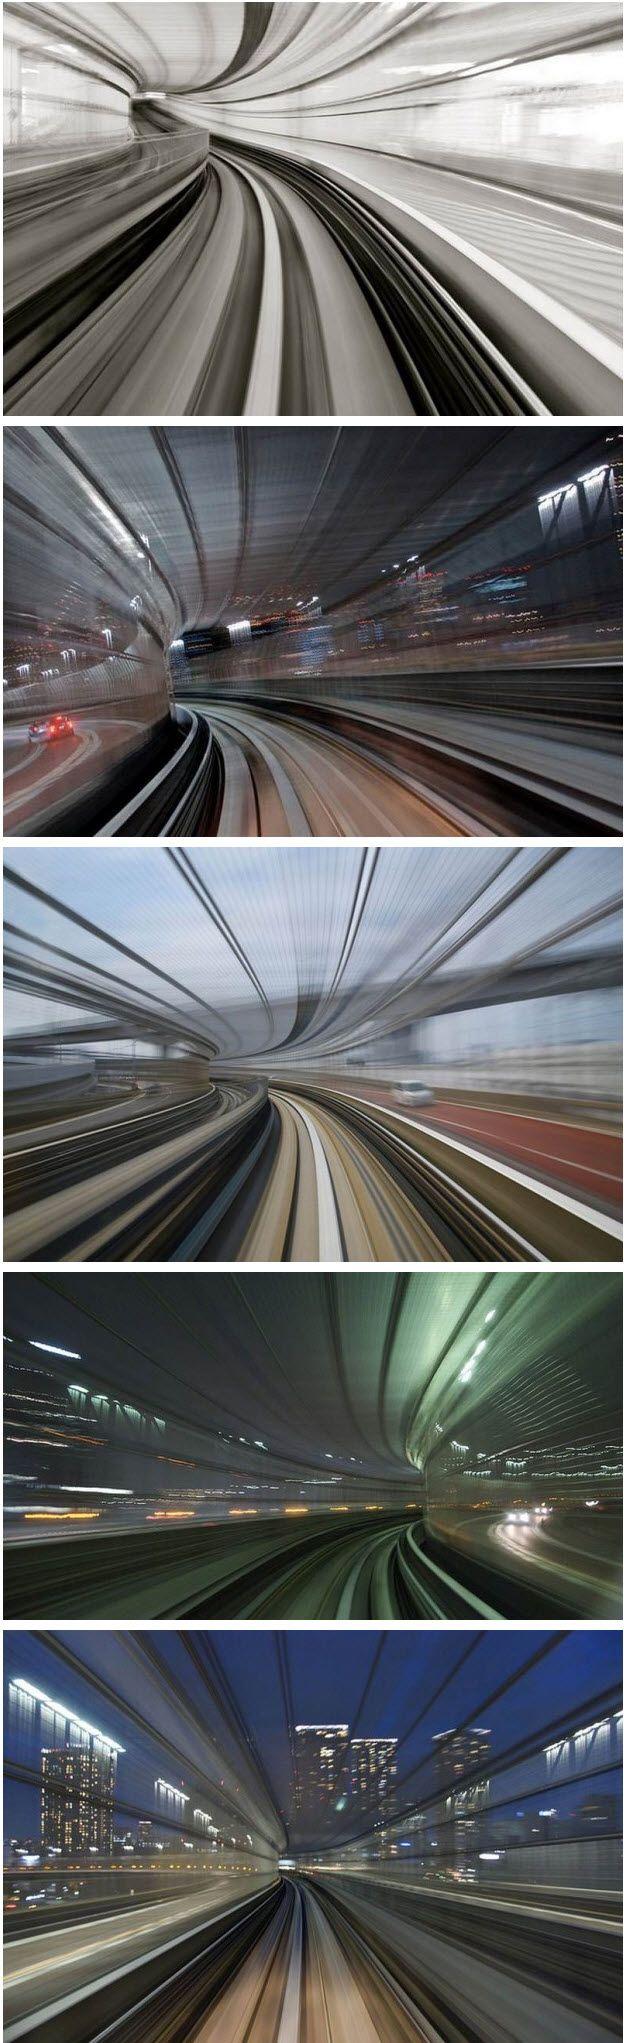 High Speed train photography